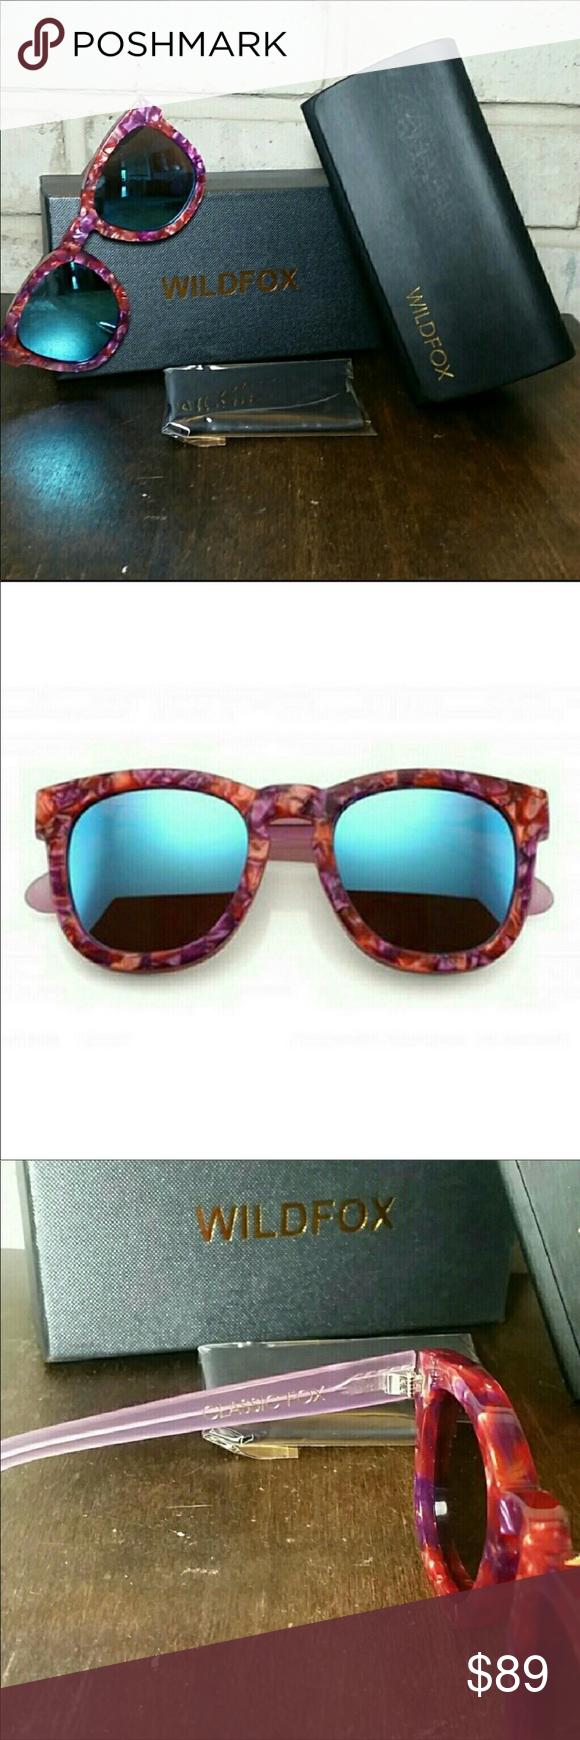 "8c5e6022207 NWOT Wildfox ""Pink Wildflower"" Sunglasses 🌸 🌸 NWOT Wildfox Classic Fox  Sunglasses Called"